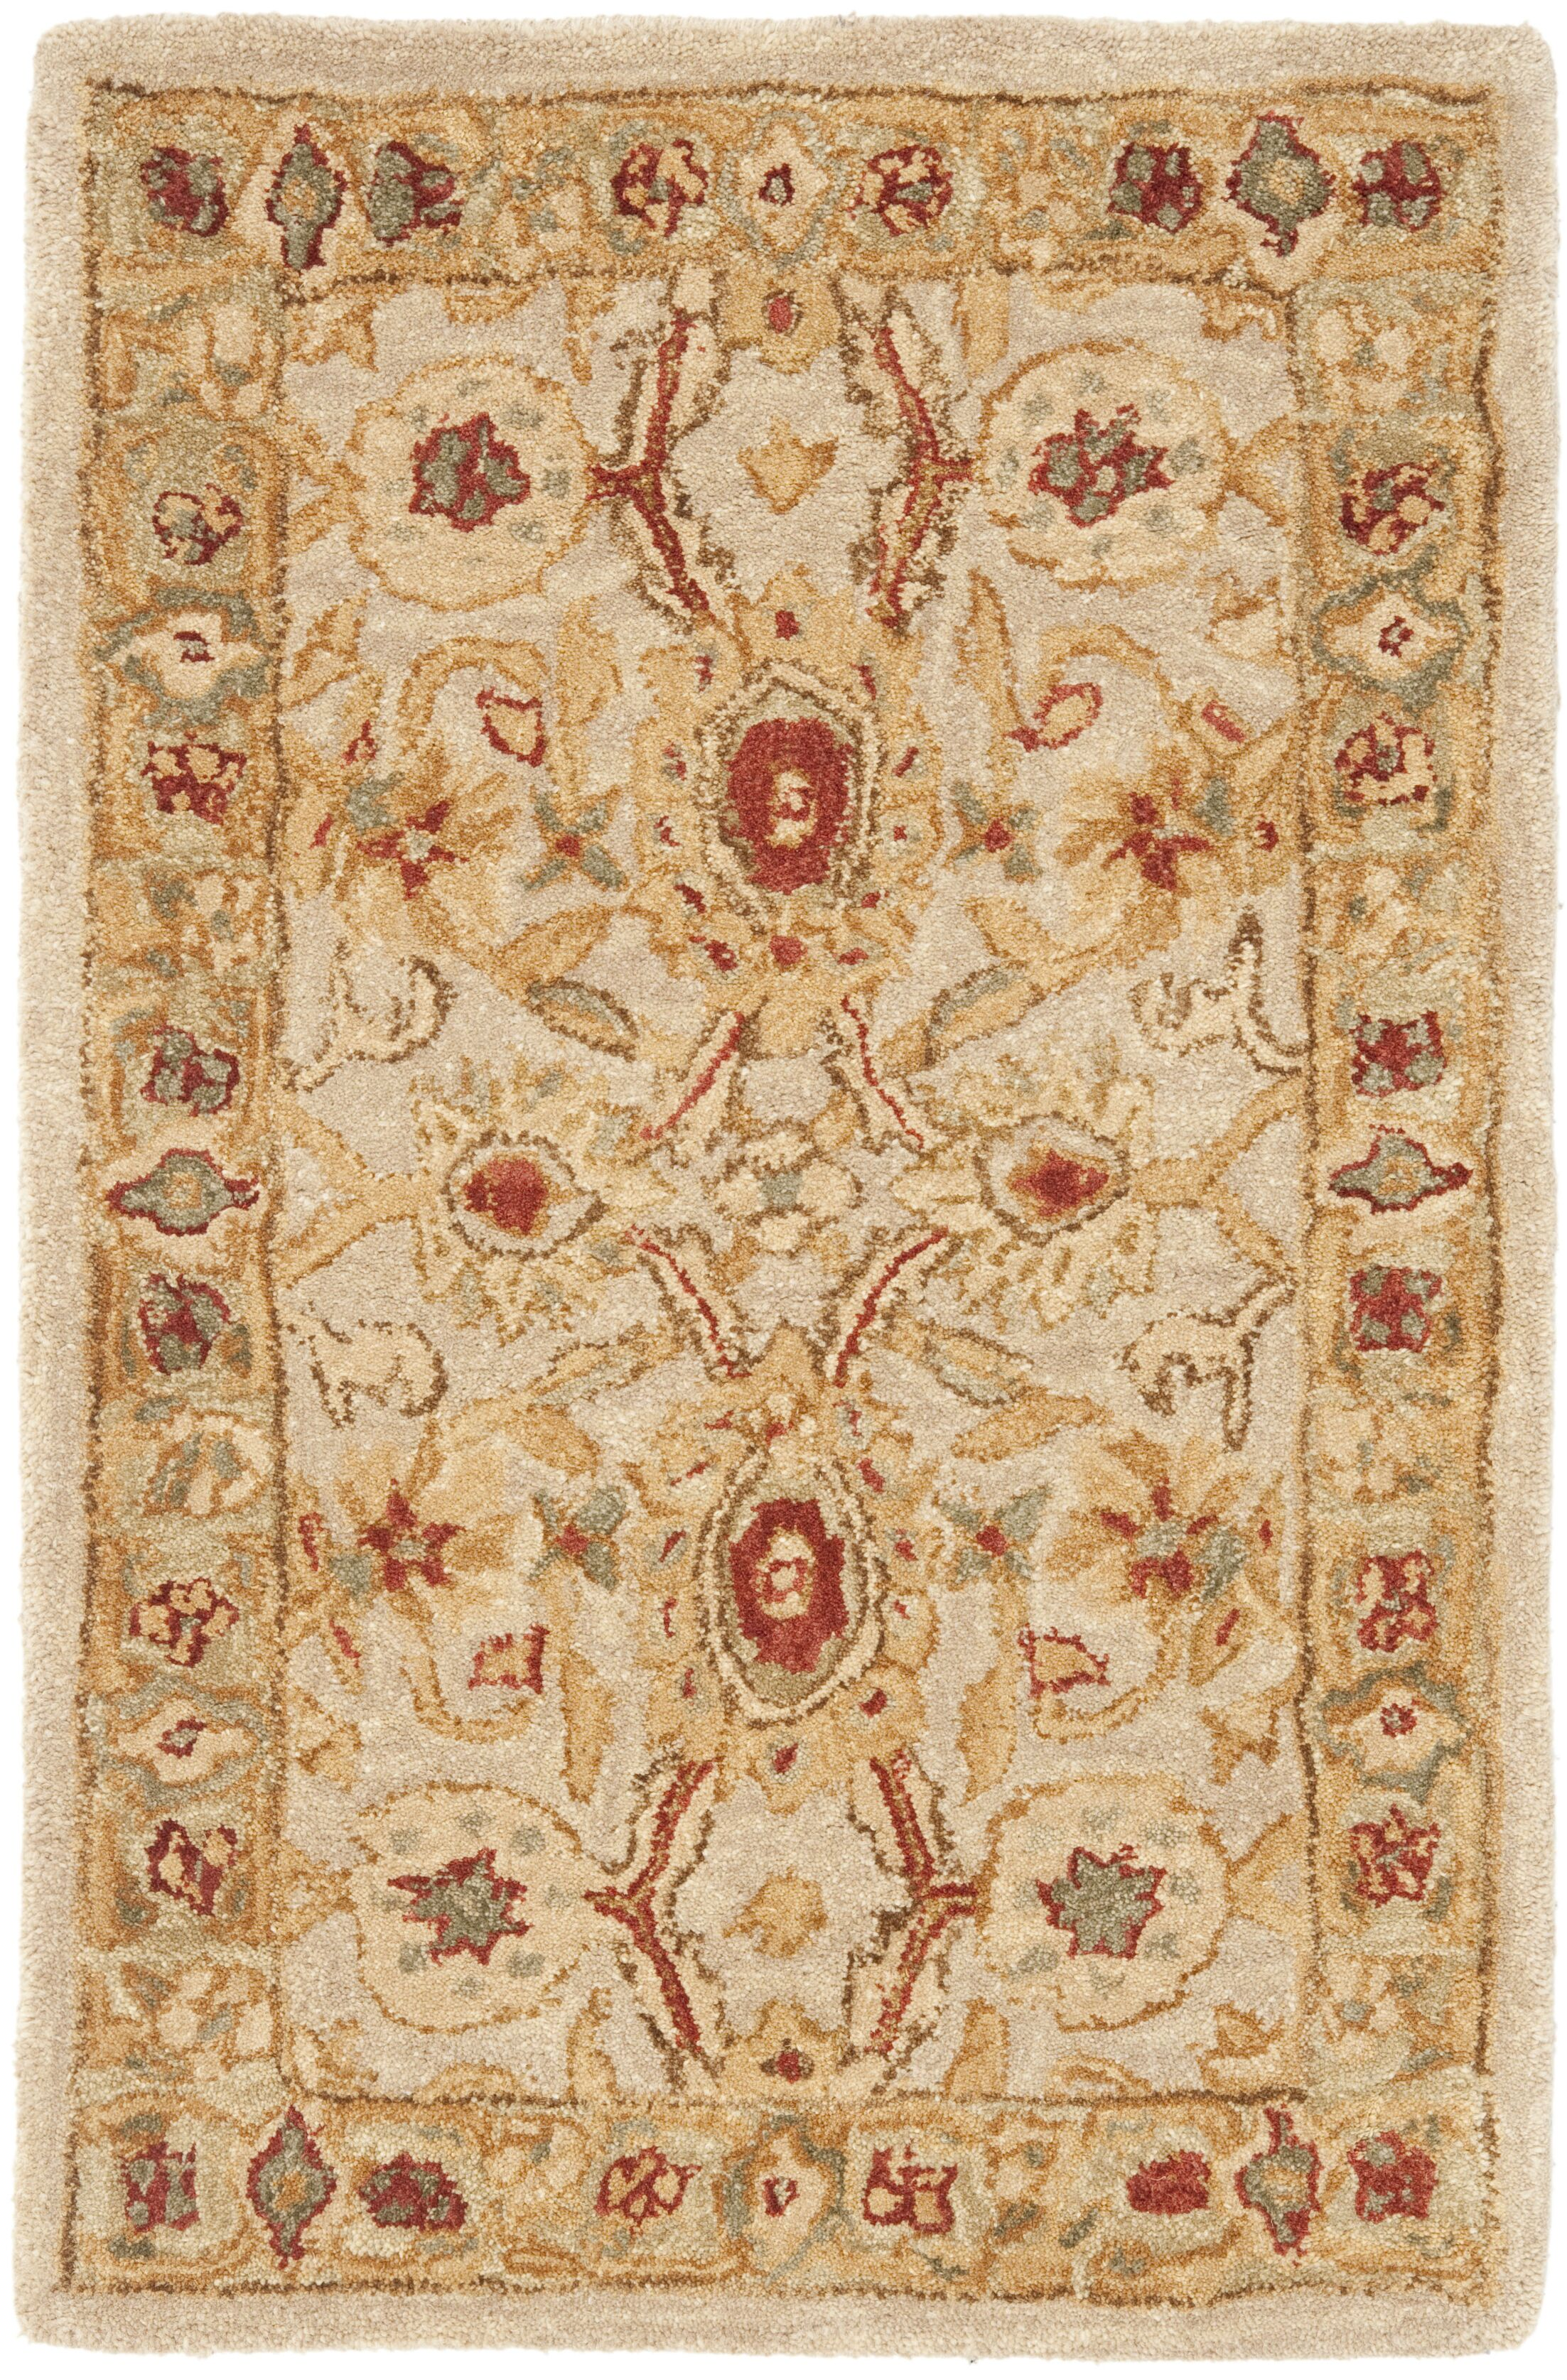 Pritchard Hand-Woven Wool Area Rug Rug Size: Rectangle 11' x 15'